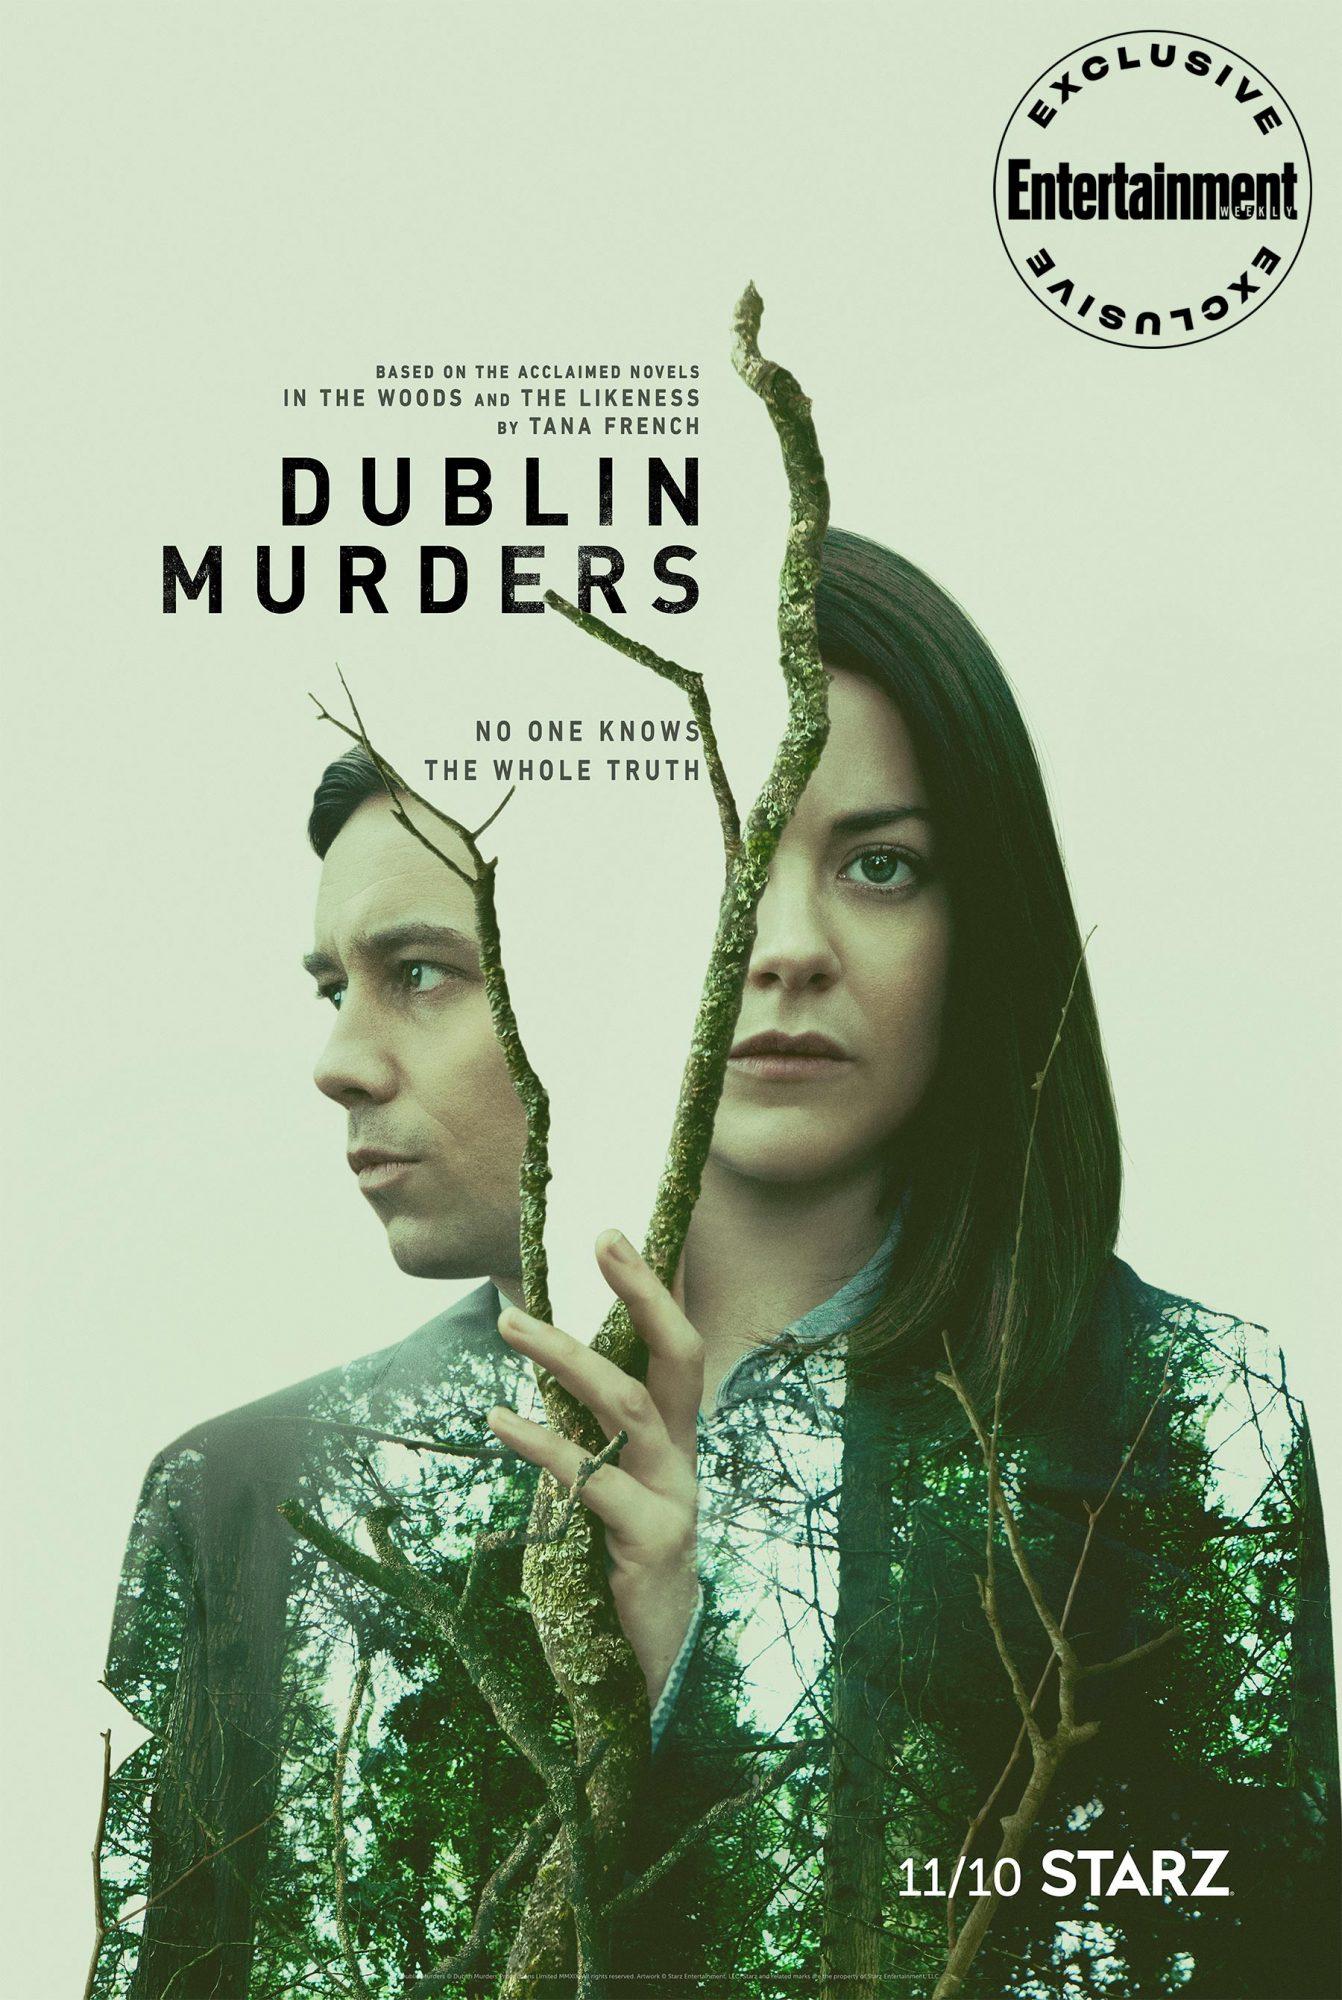 Dublin Murders key art CR: Starz